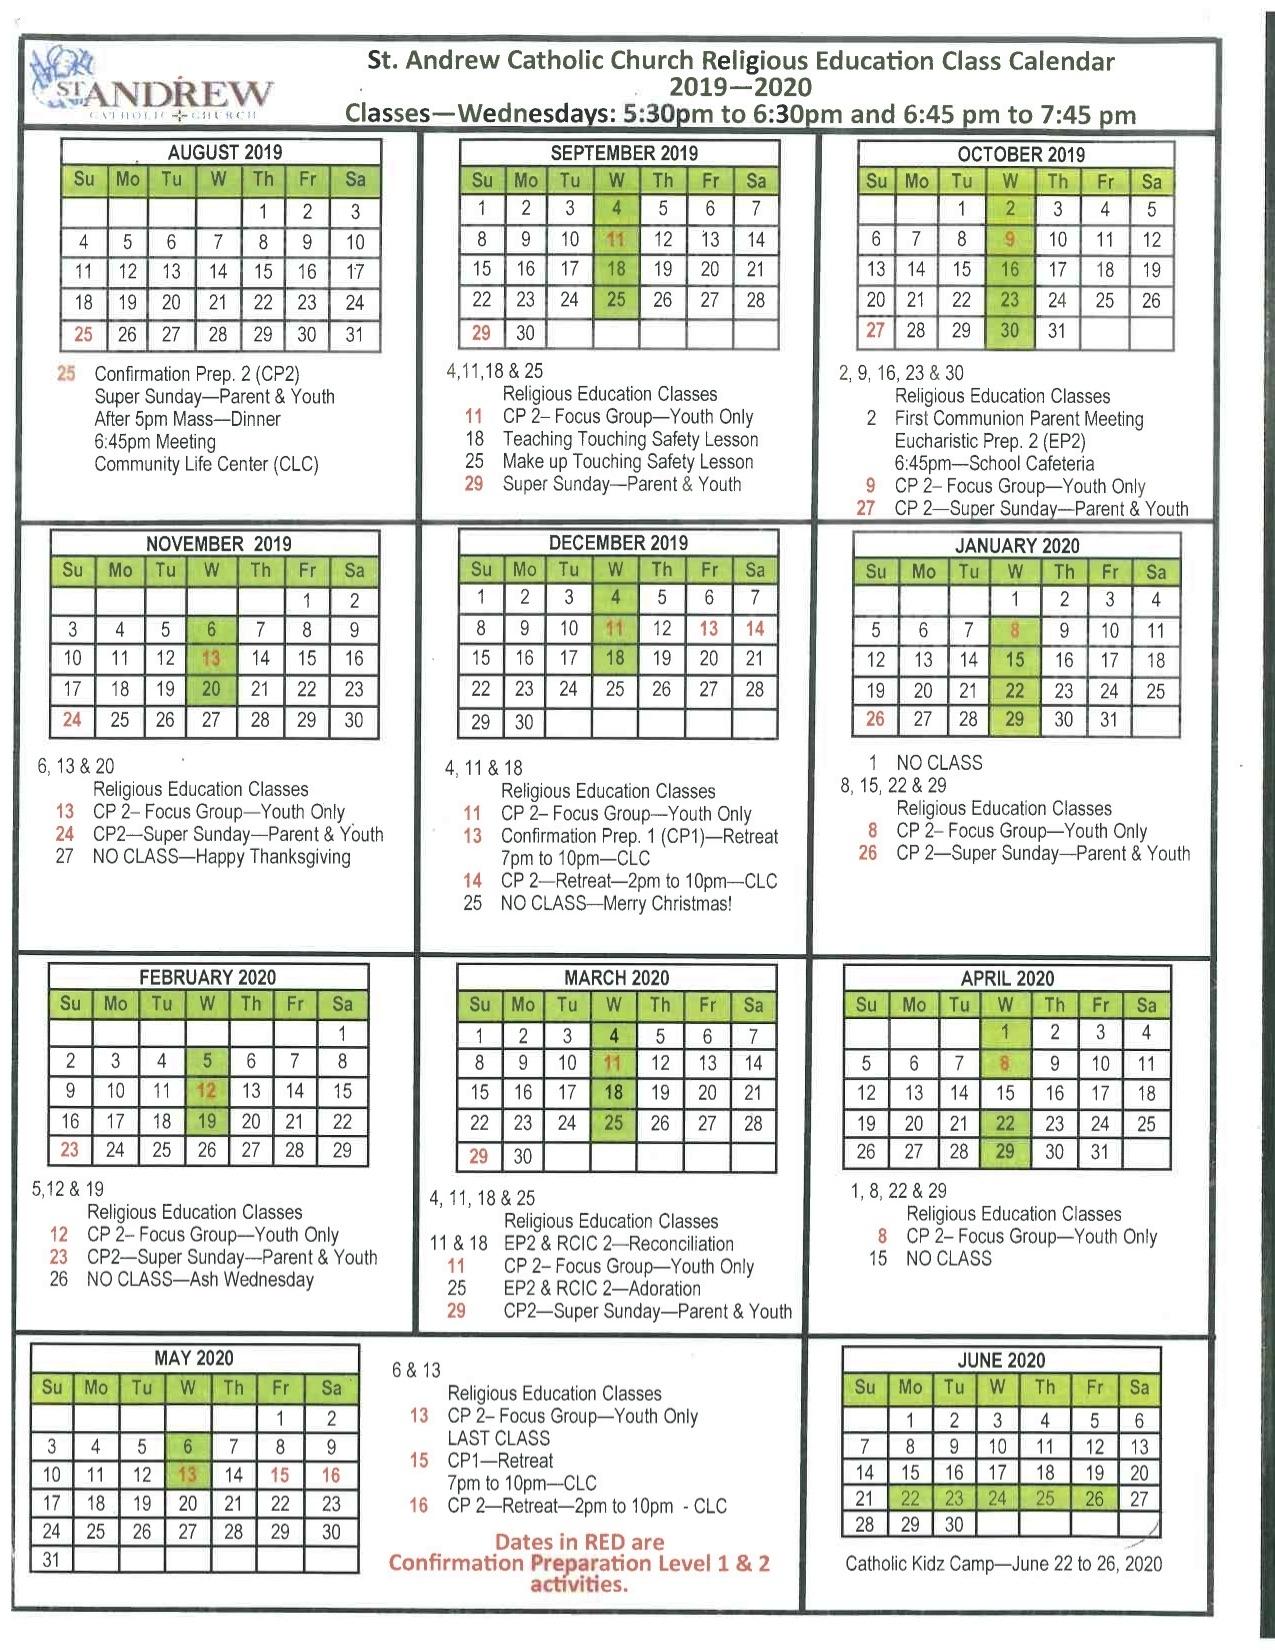 Liturgical Calendar - St. Andrew Catholic School inside Liturgical Calendar 2019 2020 Catholic